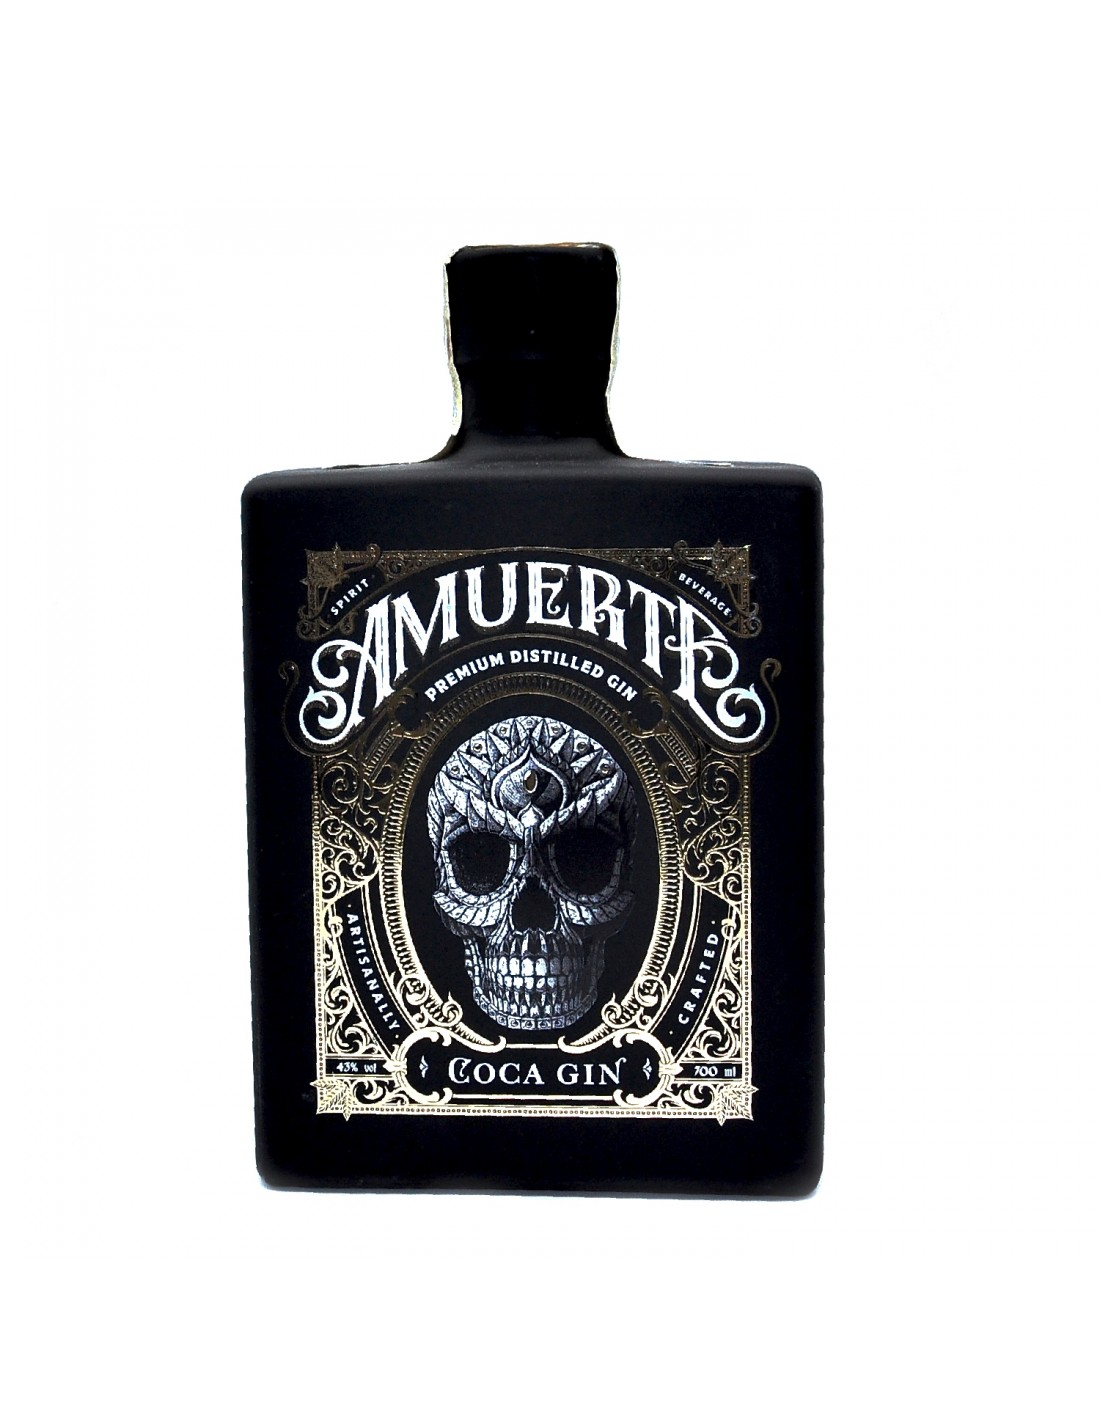 Gin Amuerte Coca Leaf Black Edition 43% alc., 0.7L